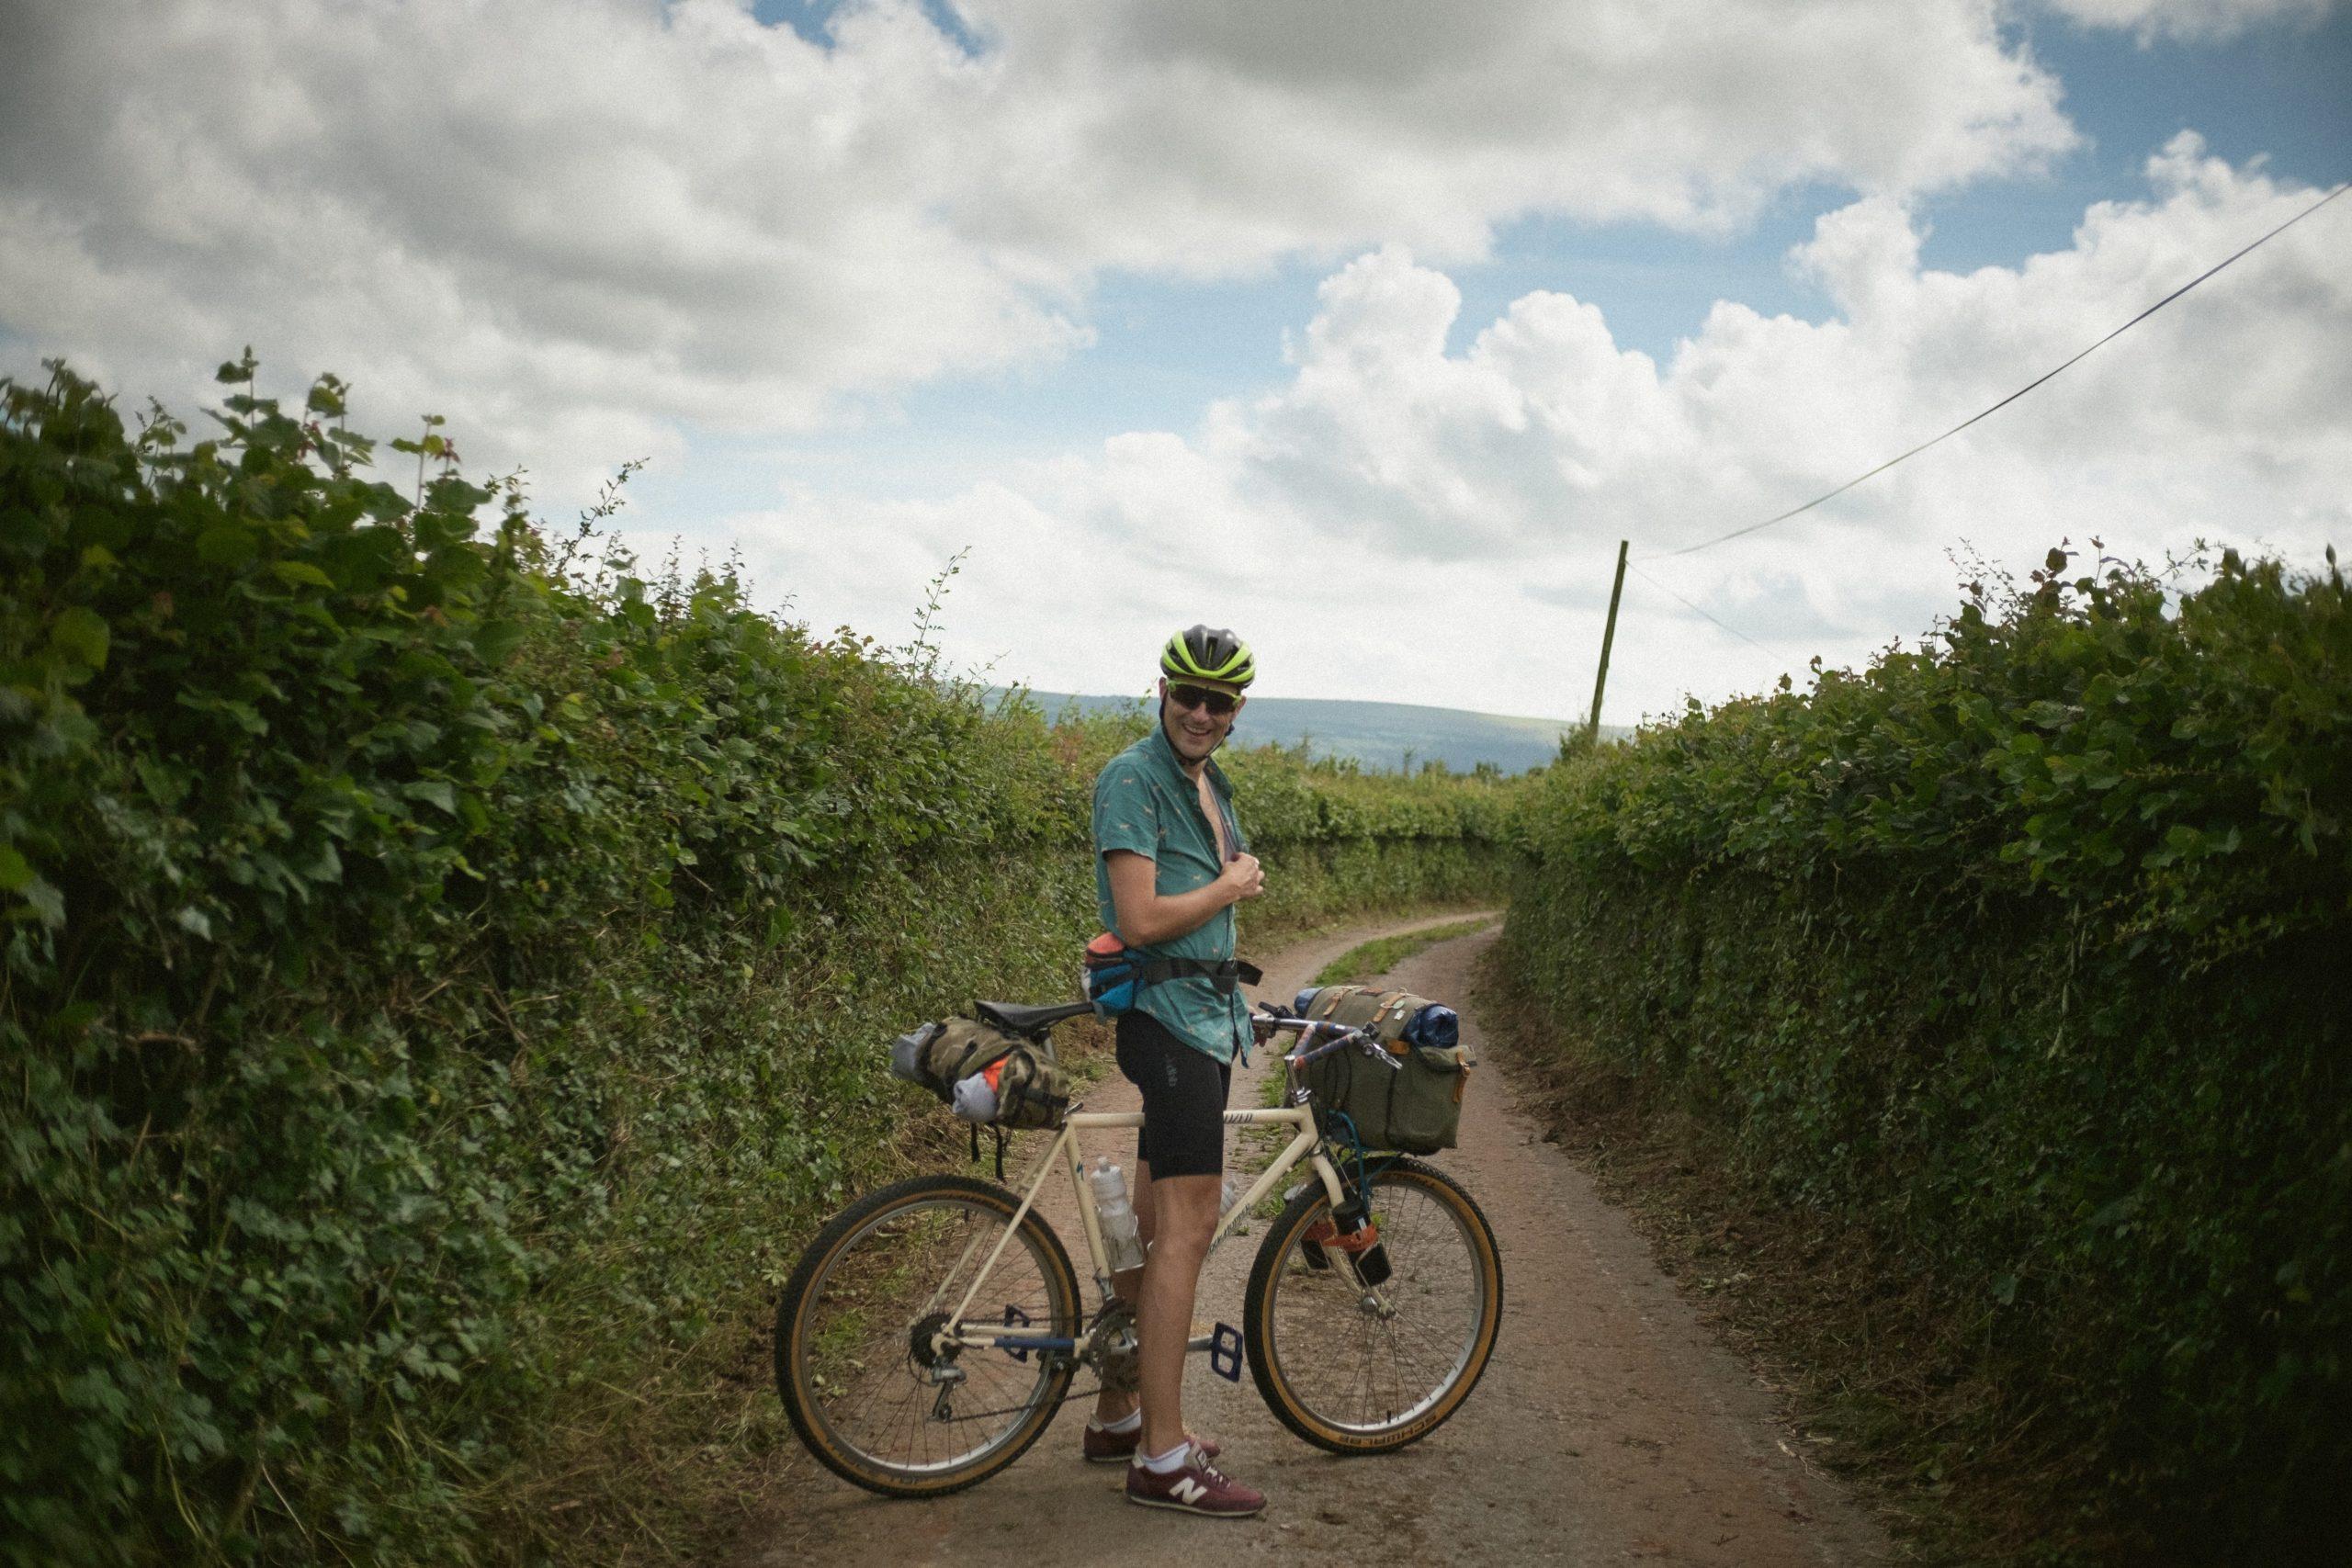 Are Gravel Bikes Just 80's Mountain Bikes?